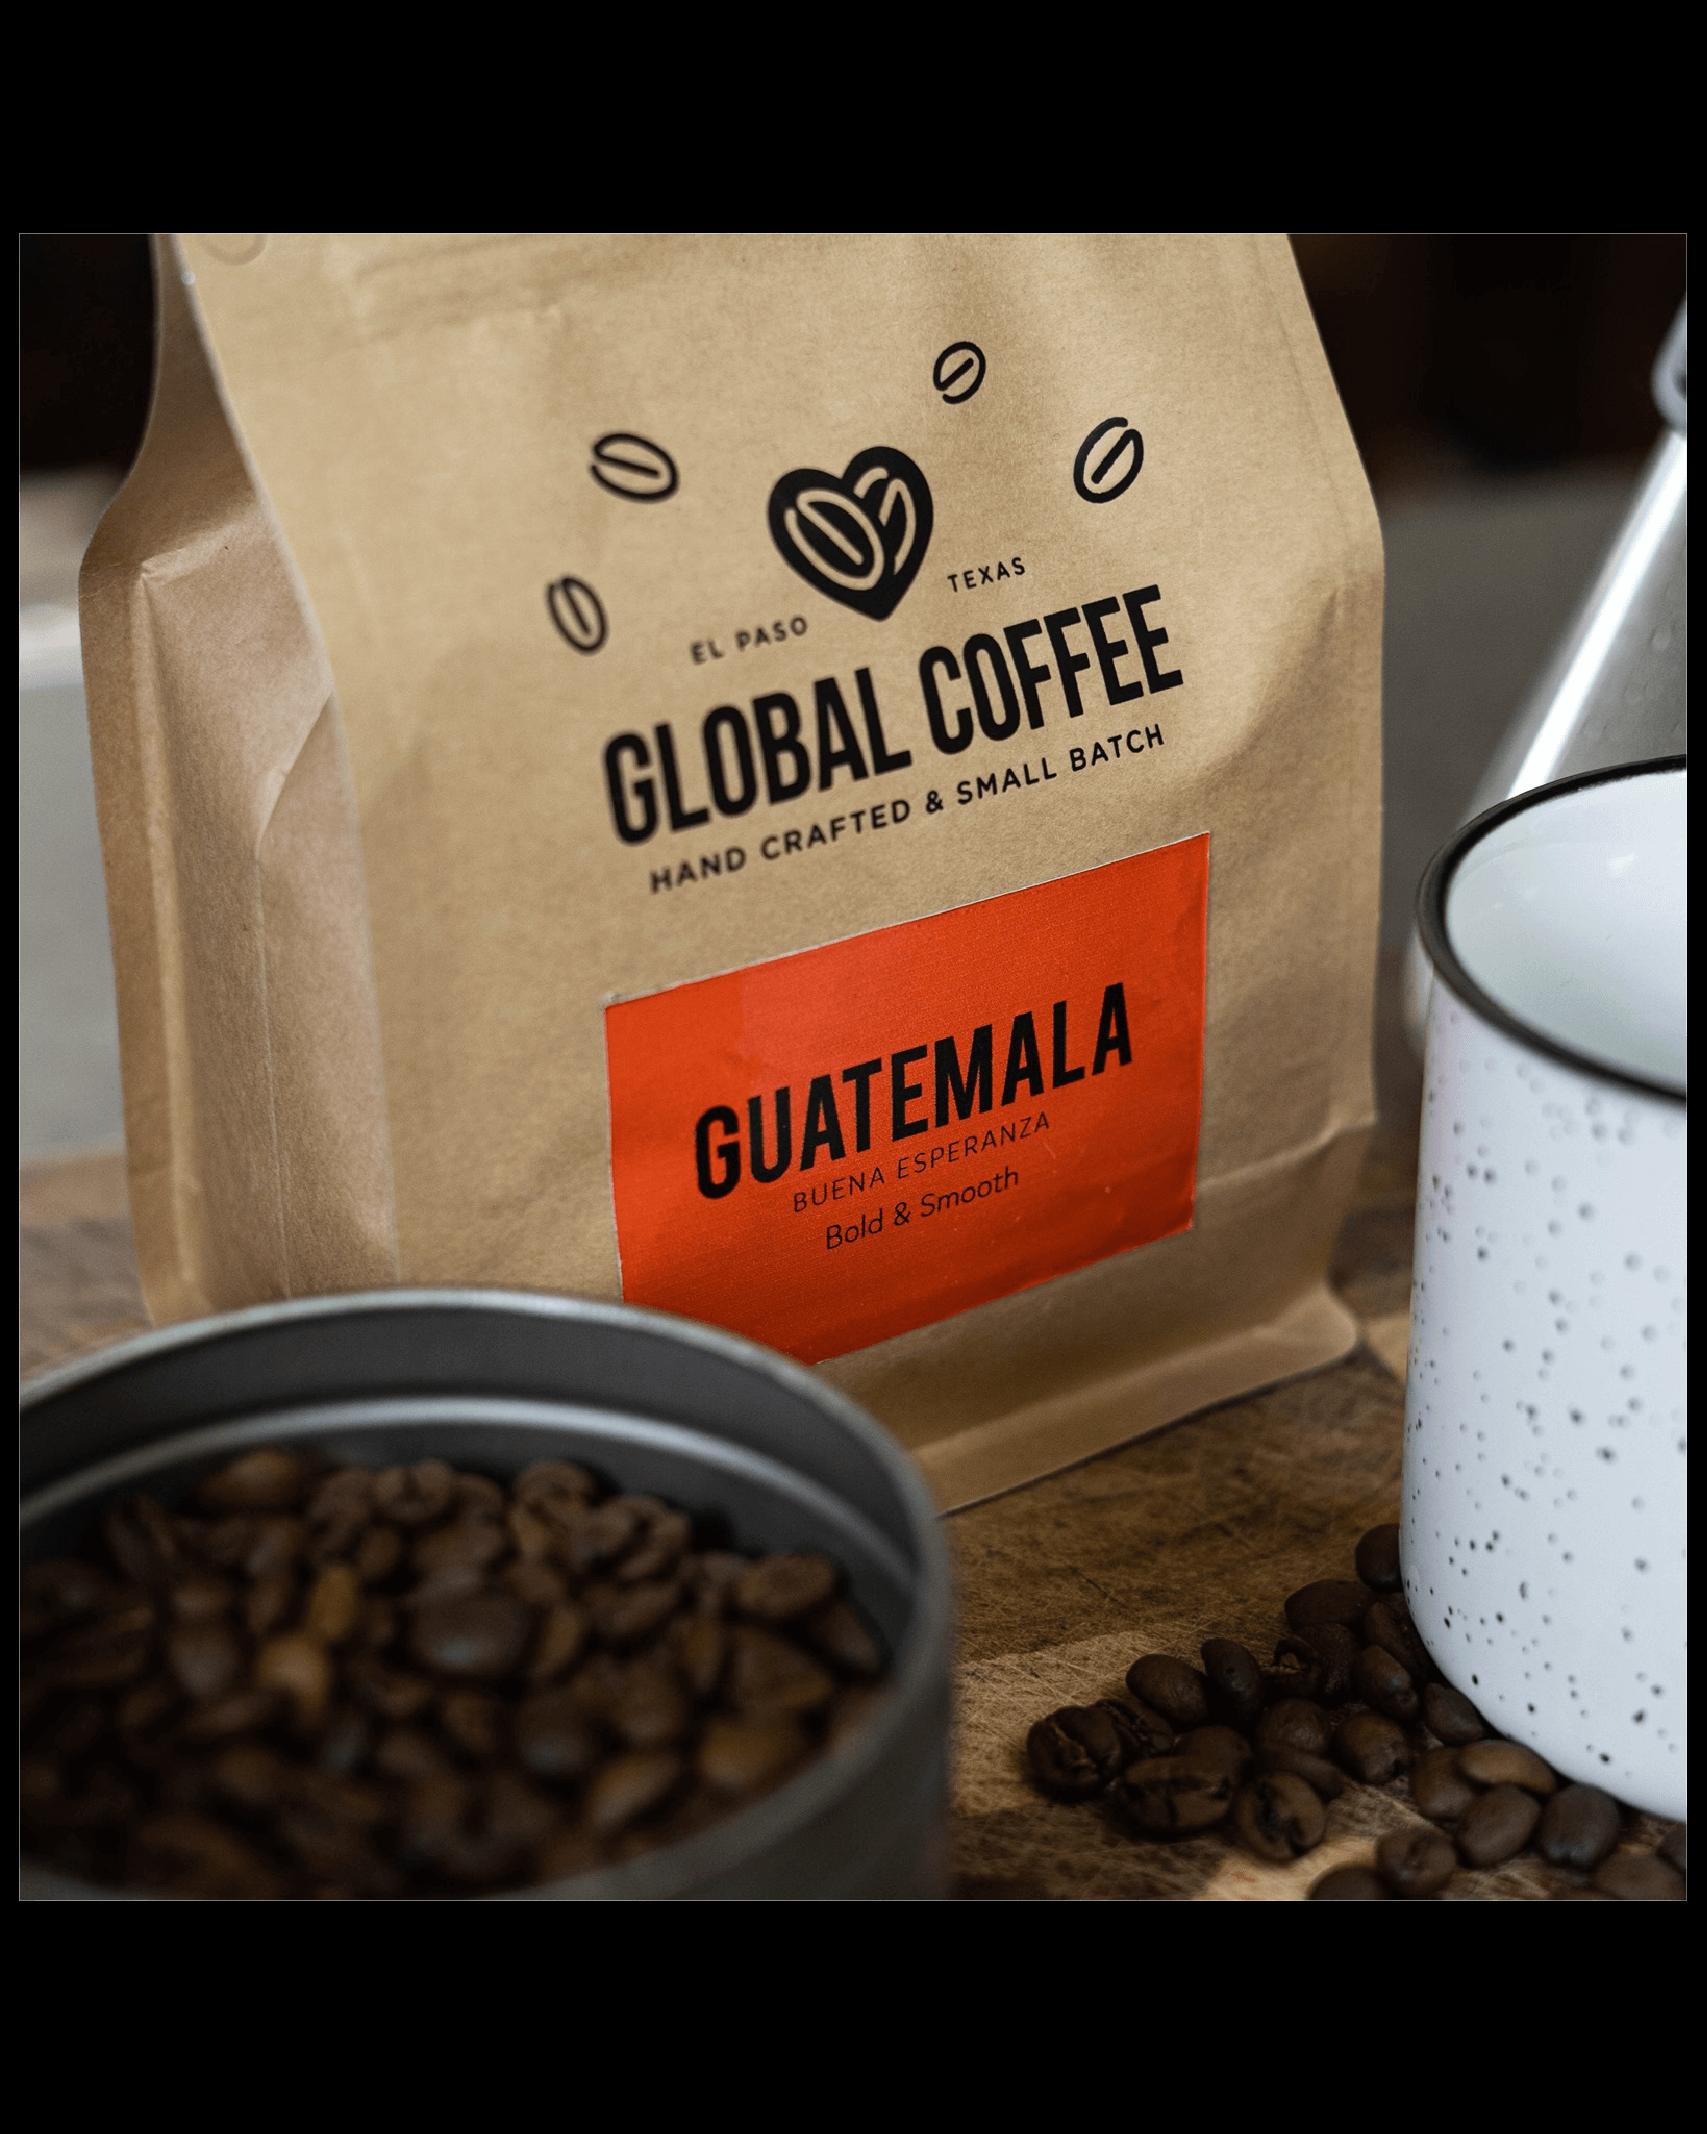 Guatemala from Global Coffee